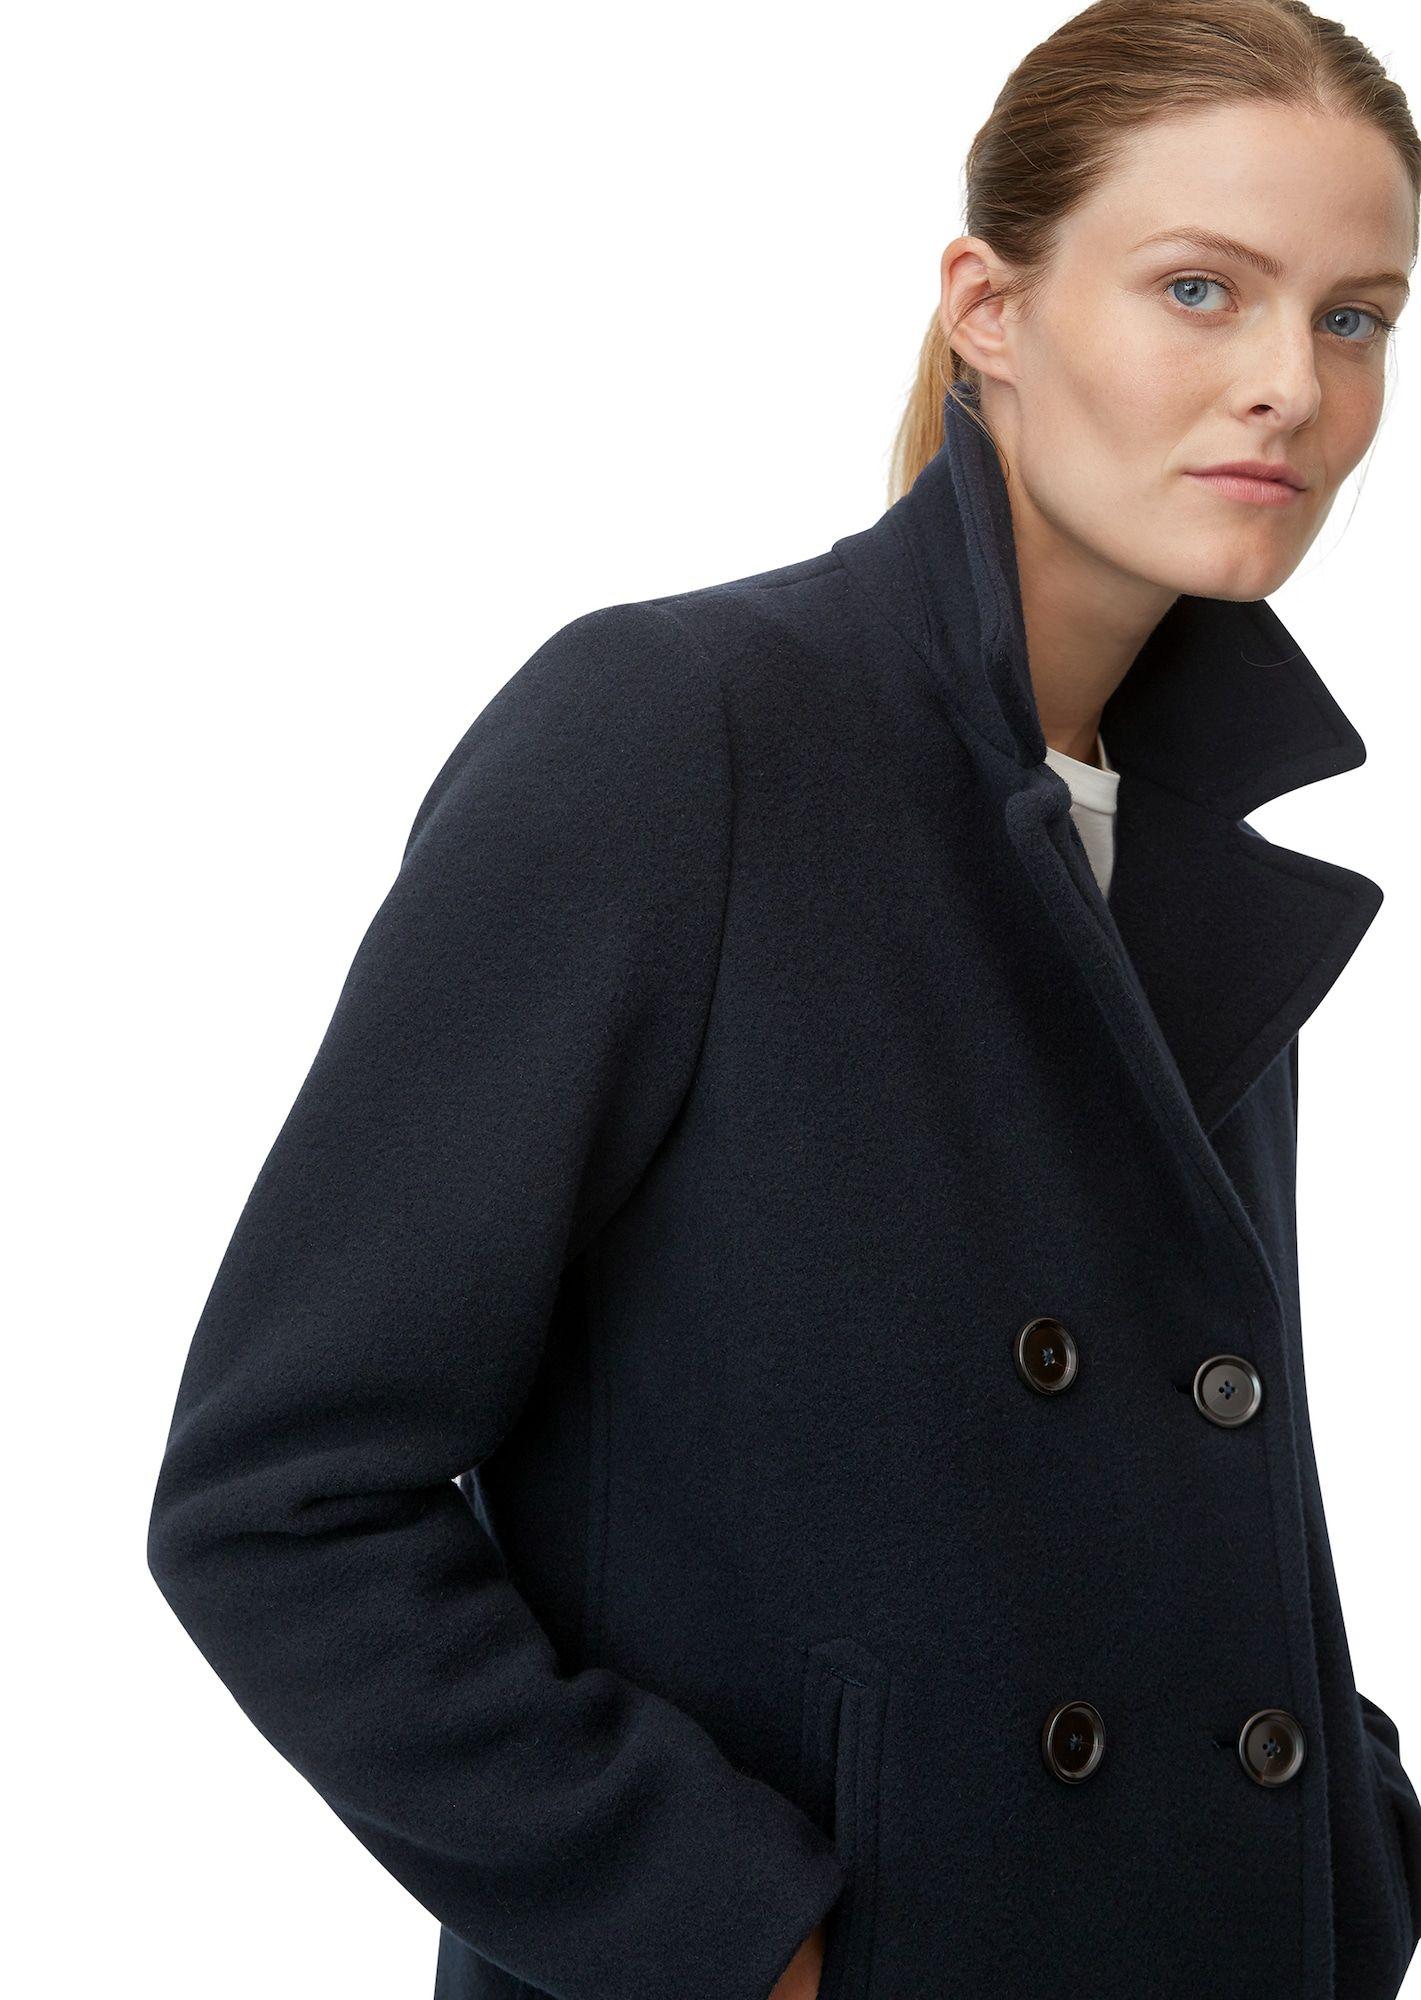 Marc O Polo Mantel Damen Nachtblau Grosse Xs Mantel Damen Nachtblau Und Mantel